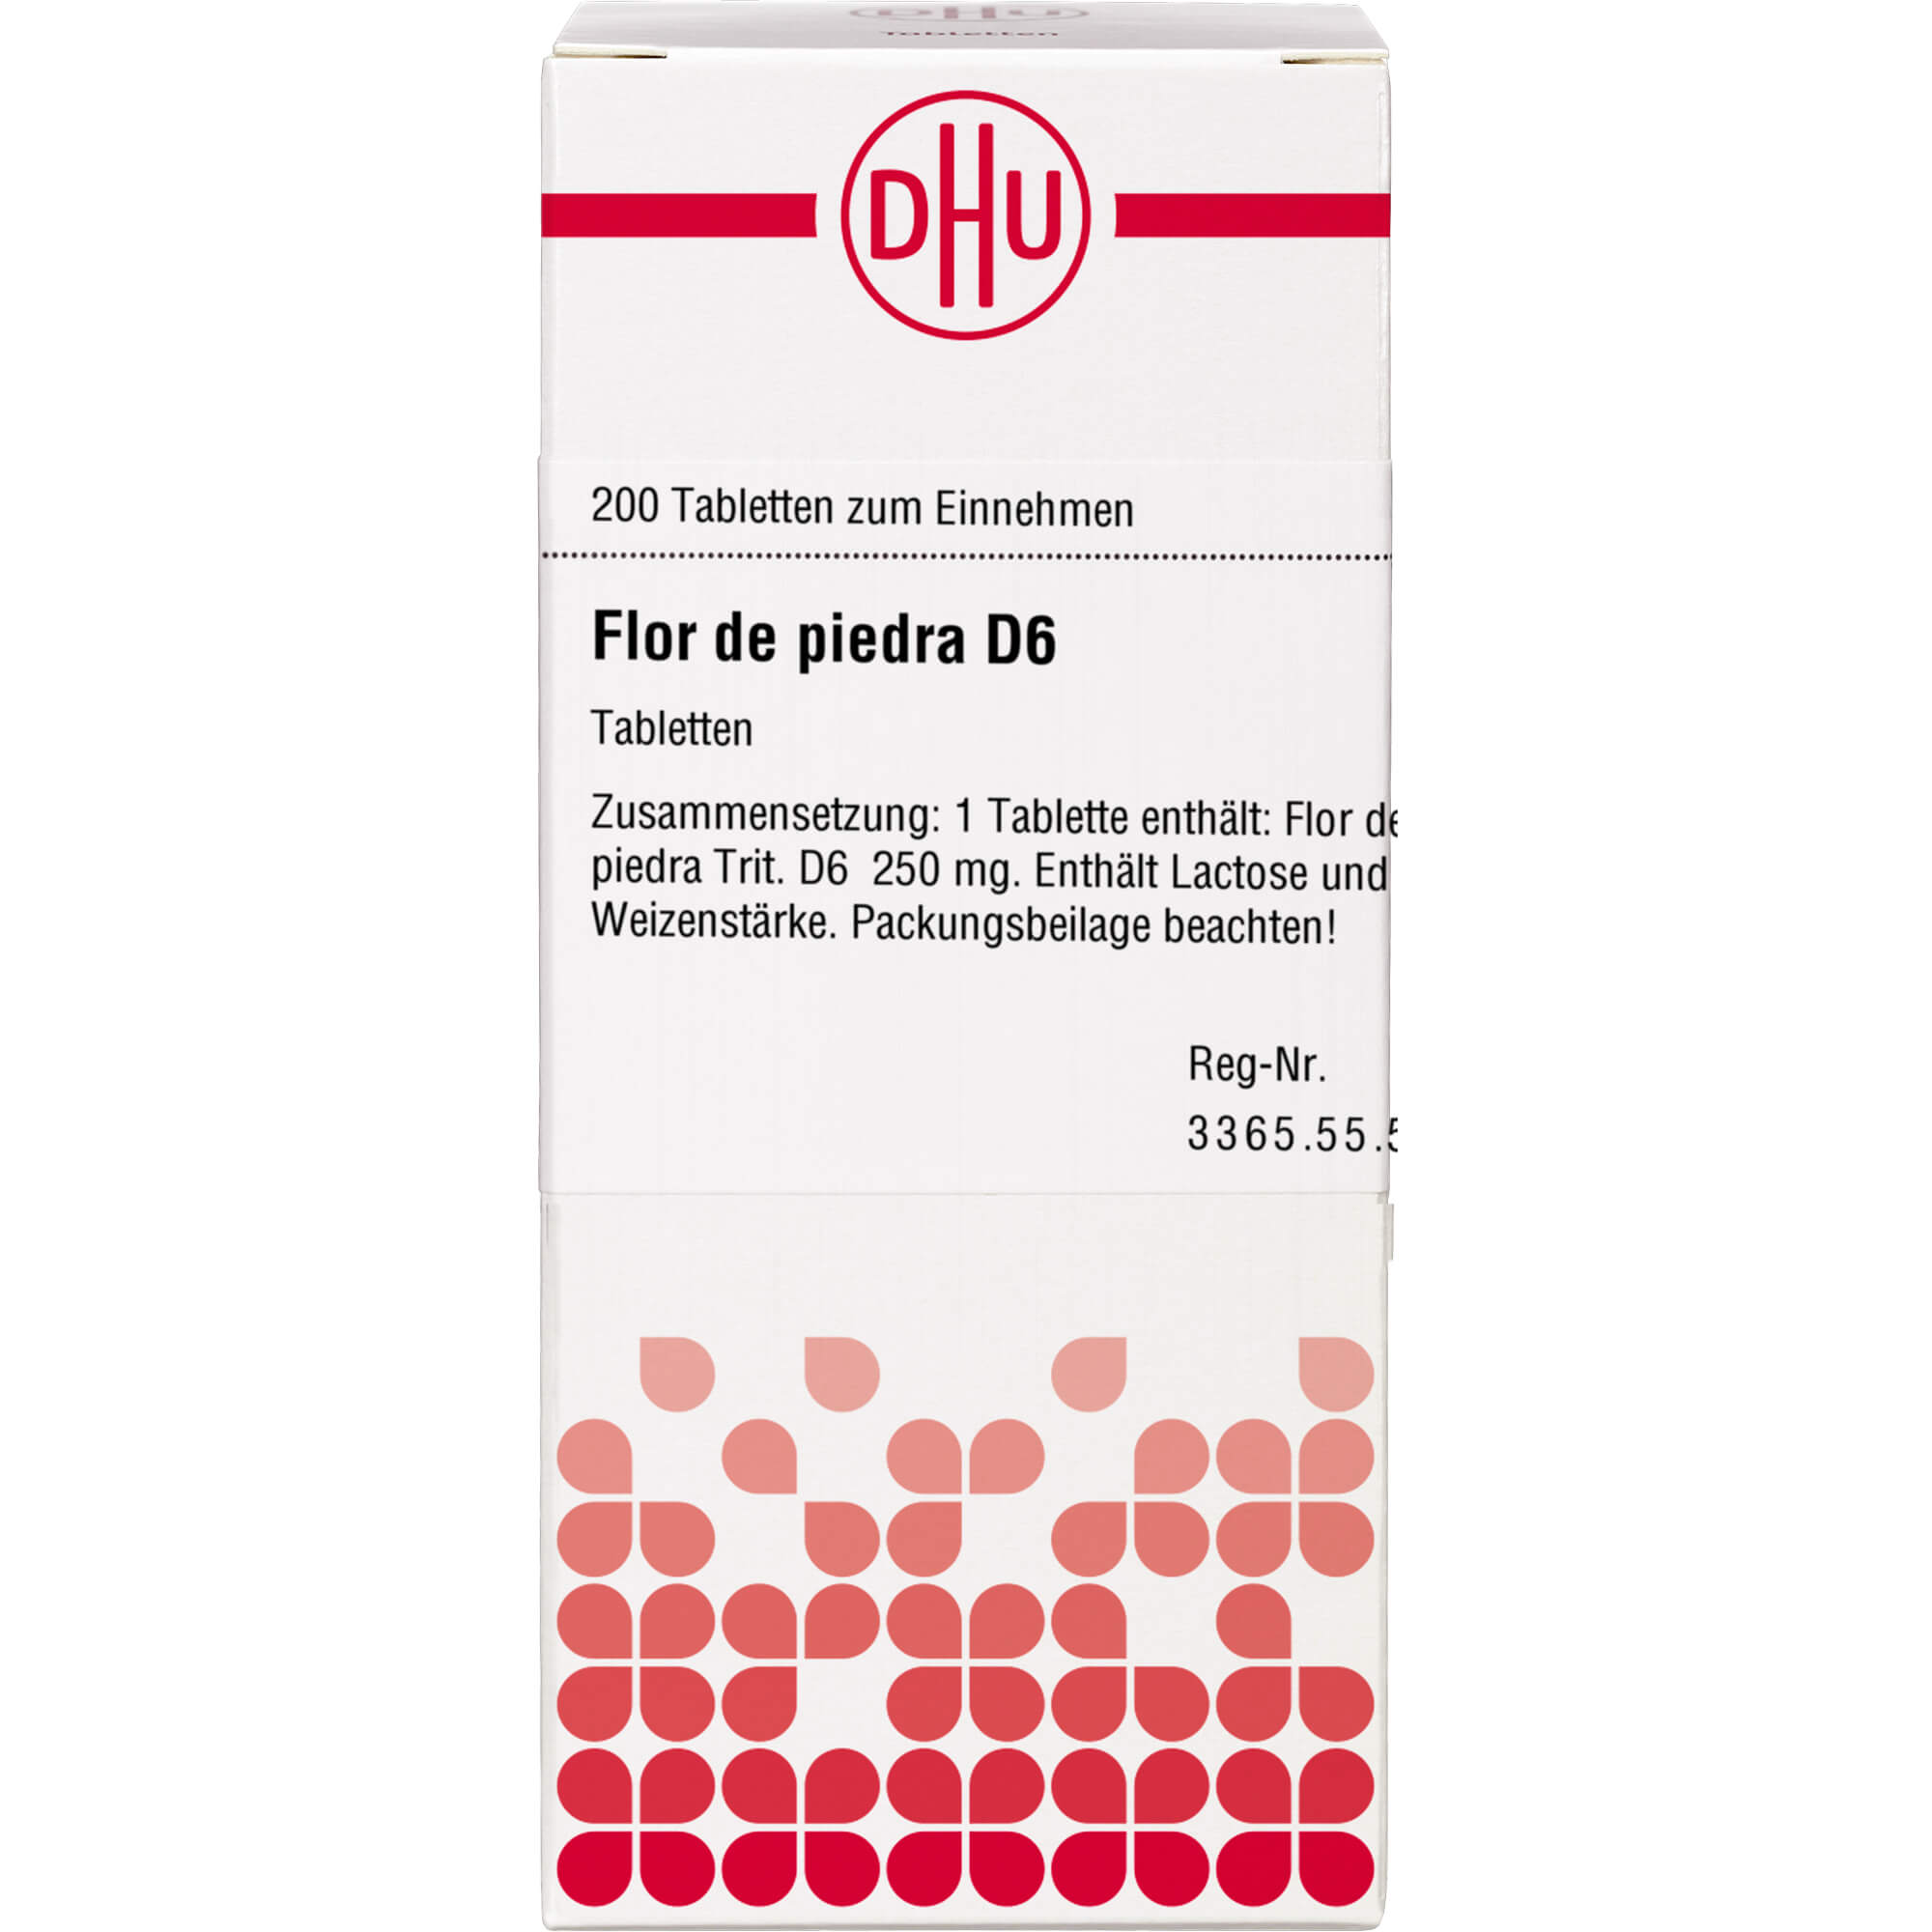 FLOR DE PIEDRA D 6 Tabletten